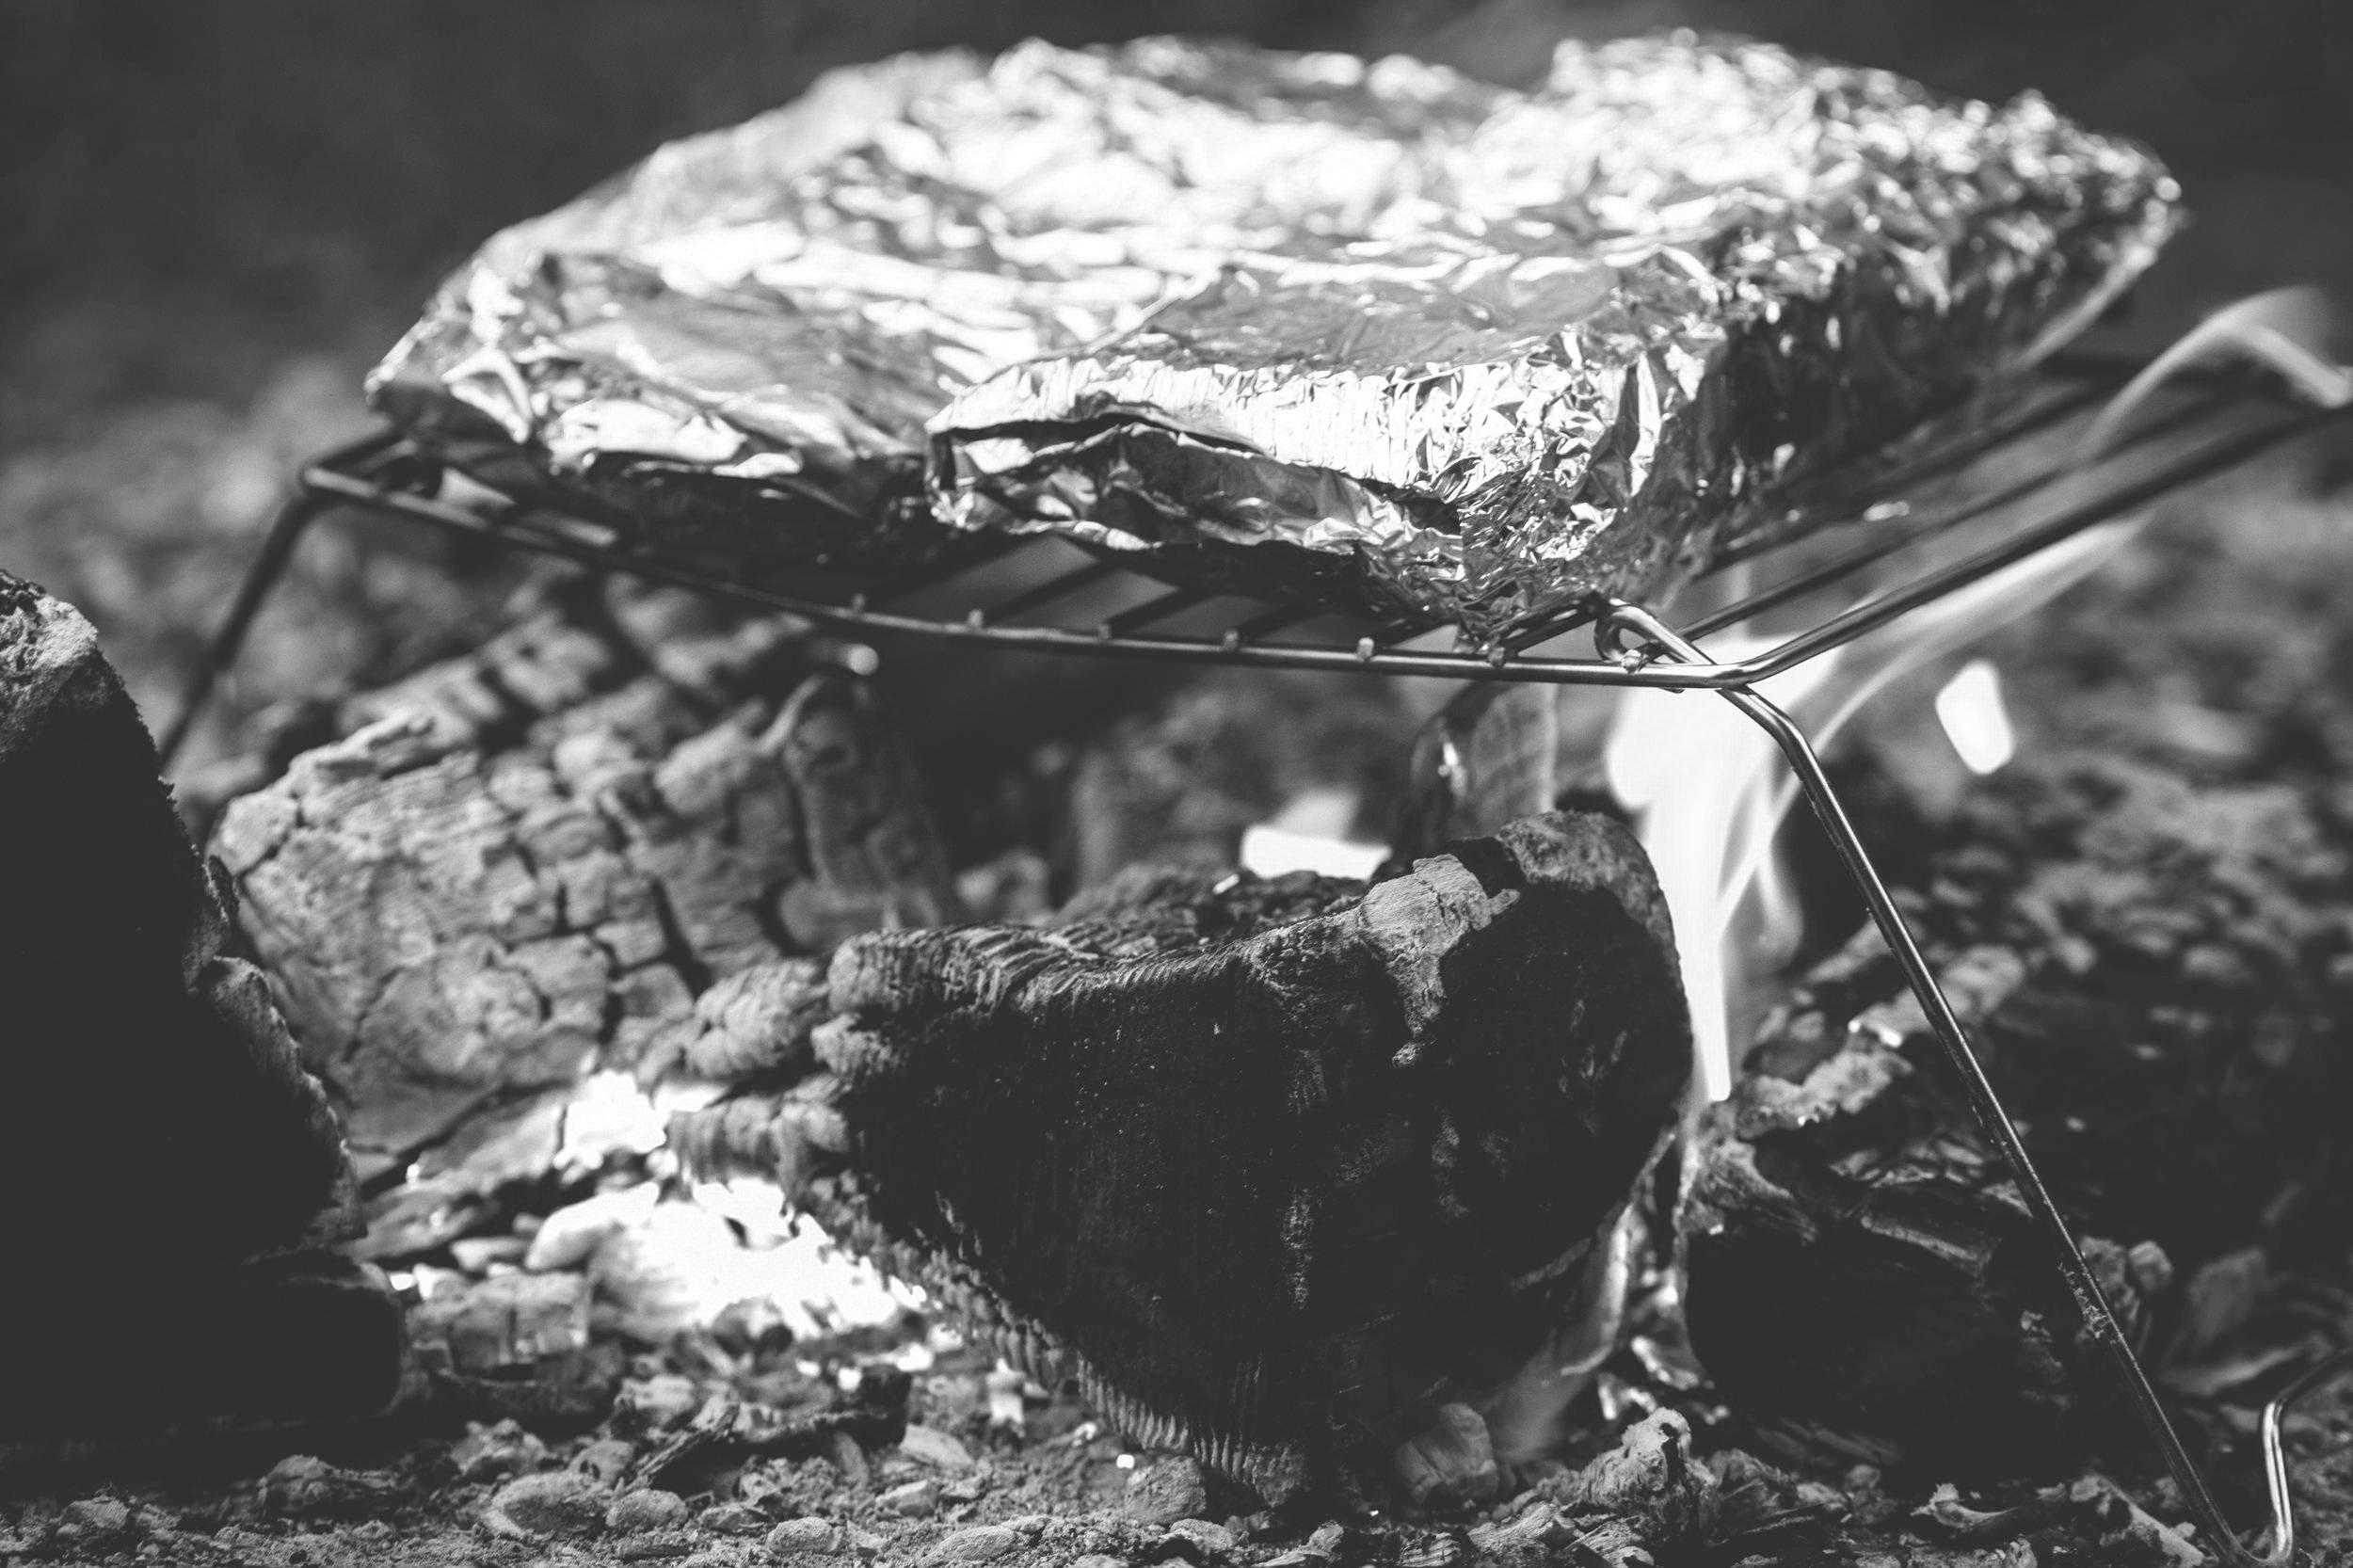 Foil Pack Breakfast -